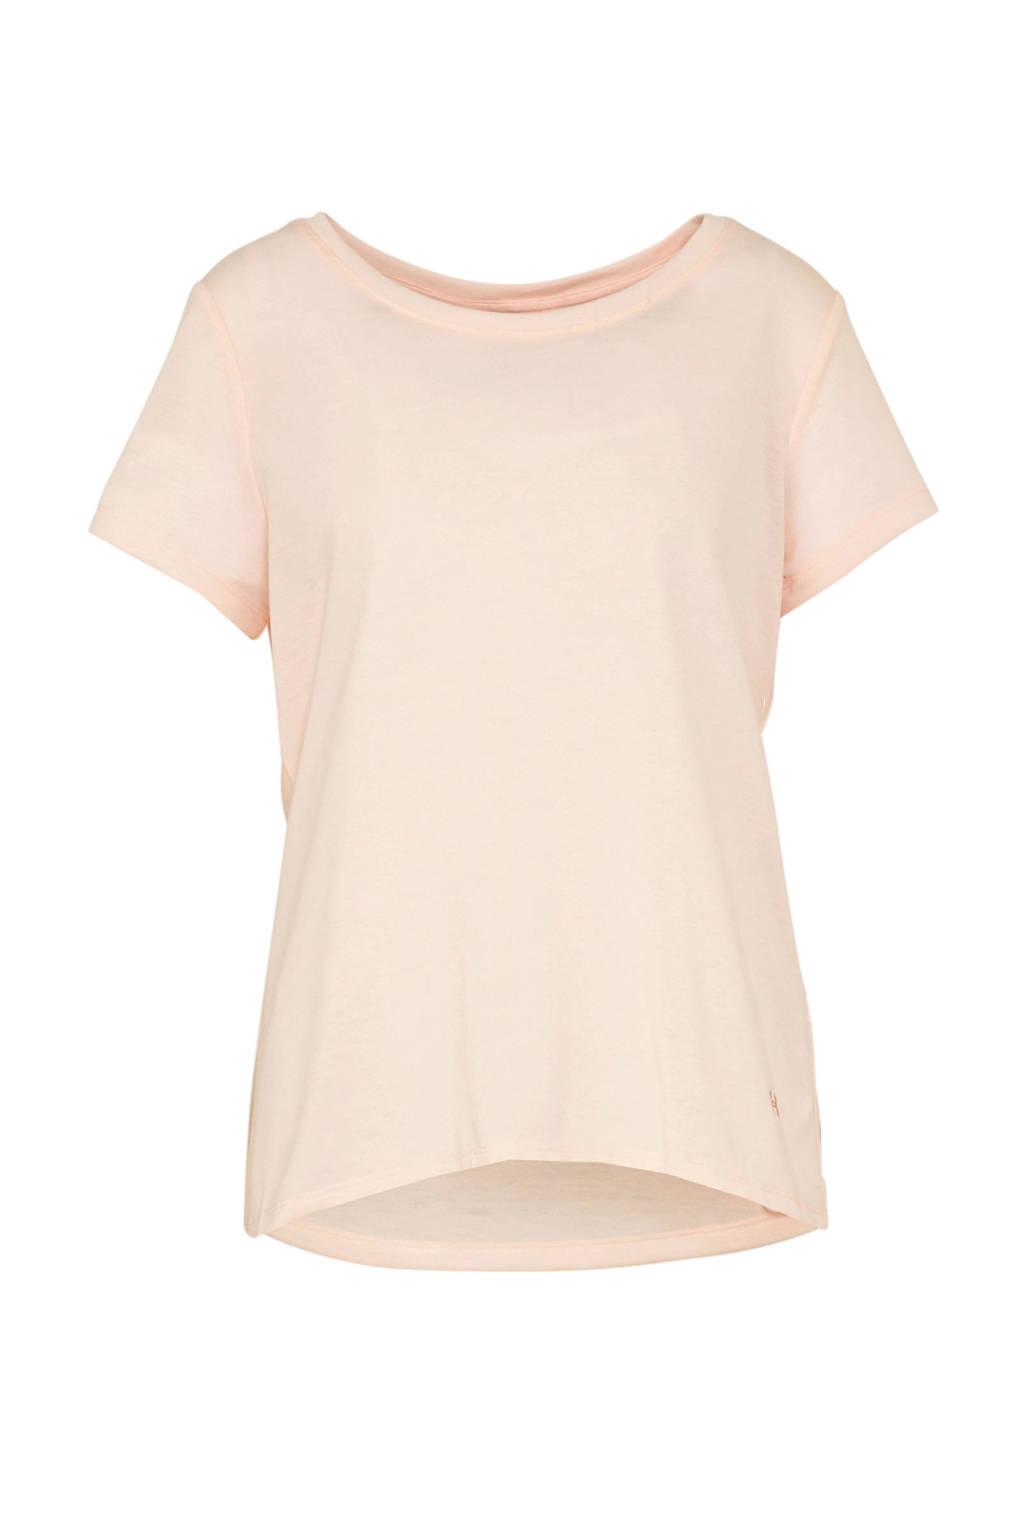 Under Armour sport T-shirt met open detail roze, Roze